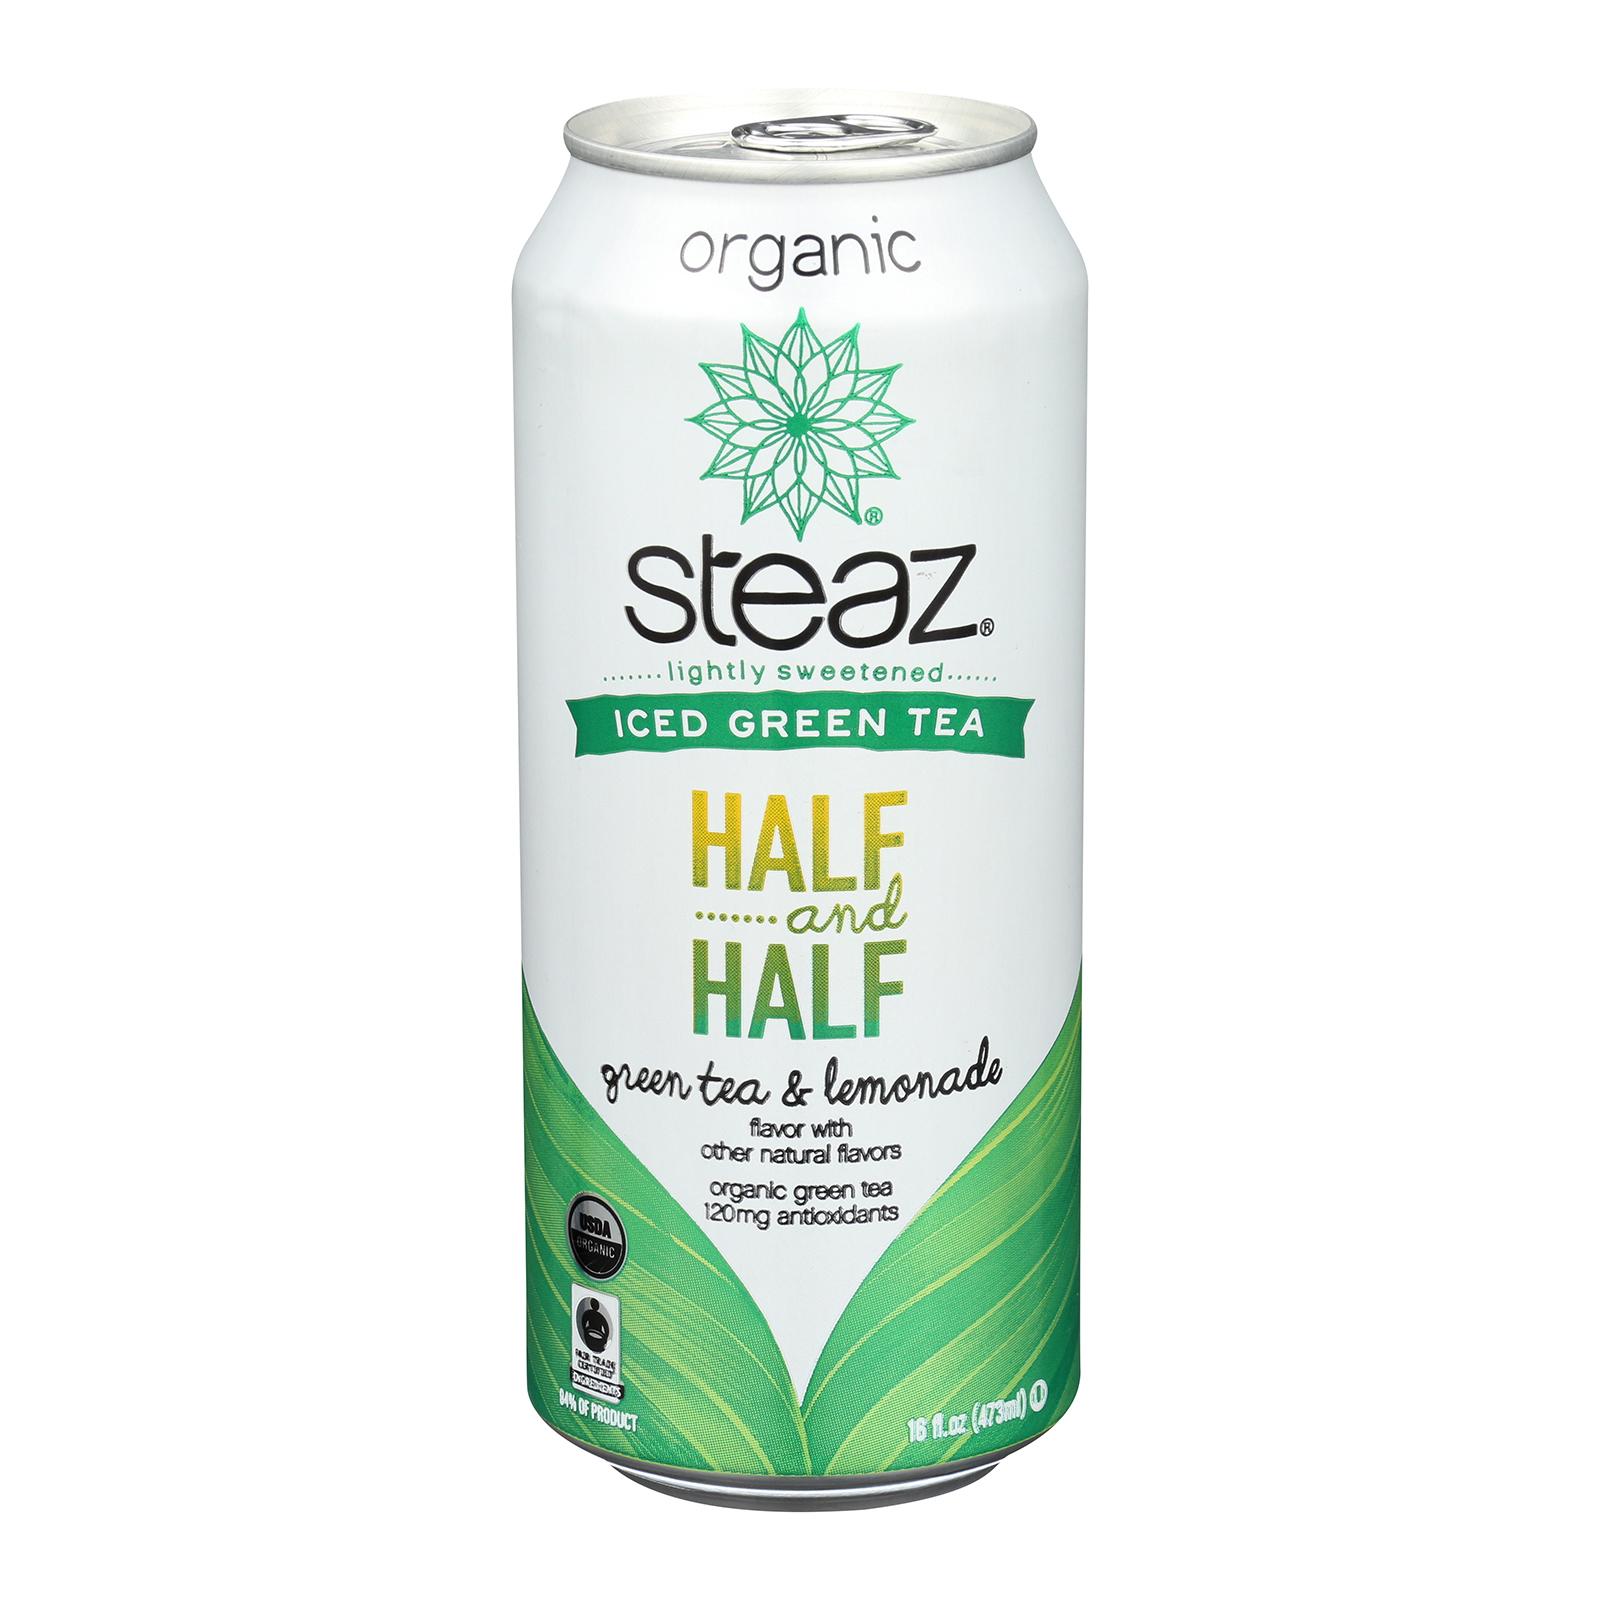 Steaz Lightly Sweetened Green Tea - Half and Half - Case of 12 - 16 Fl oz.